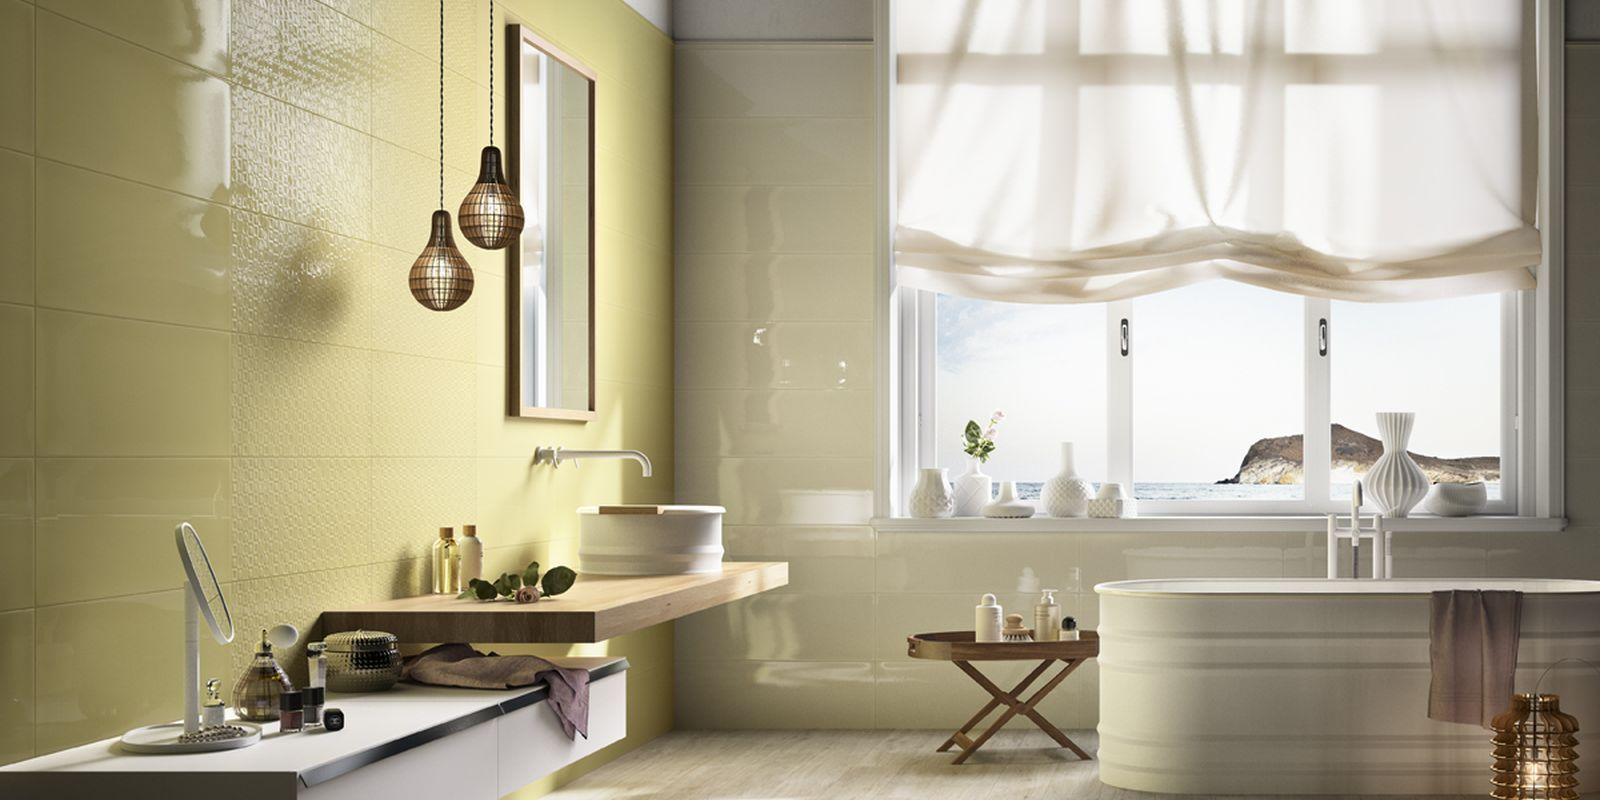 tile collection \'Poetique\' by Imola Ceramica | ks design | Pinterest ...